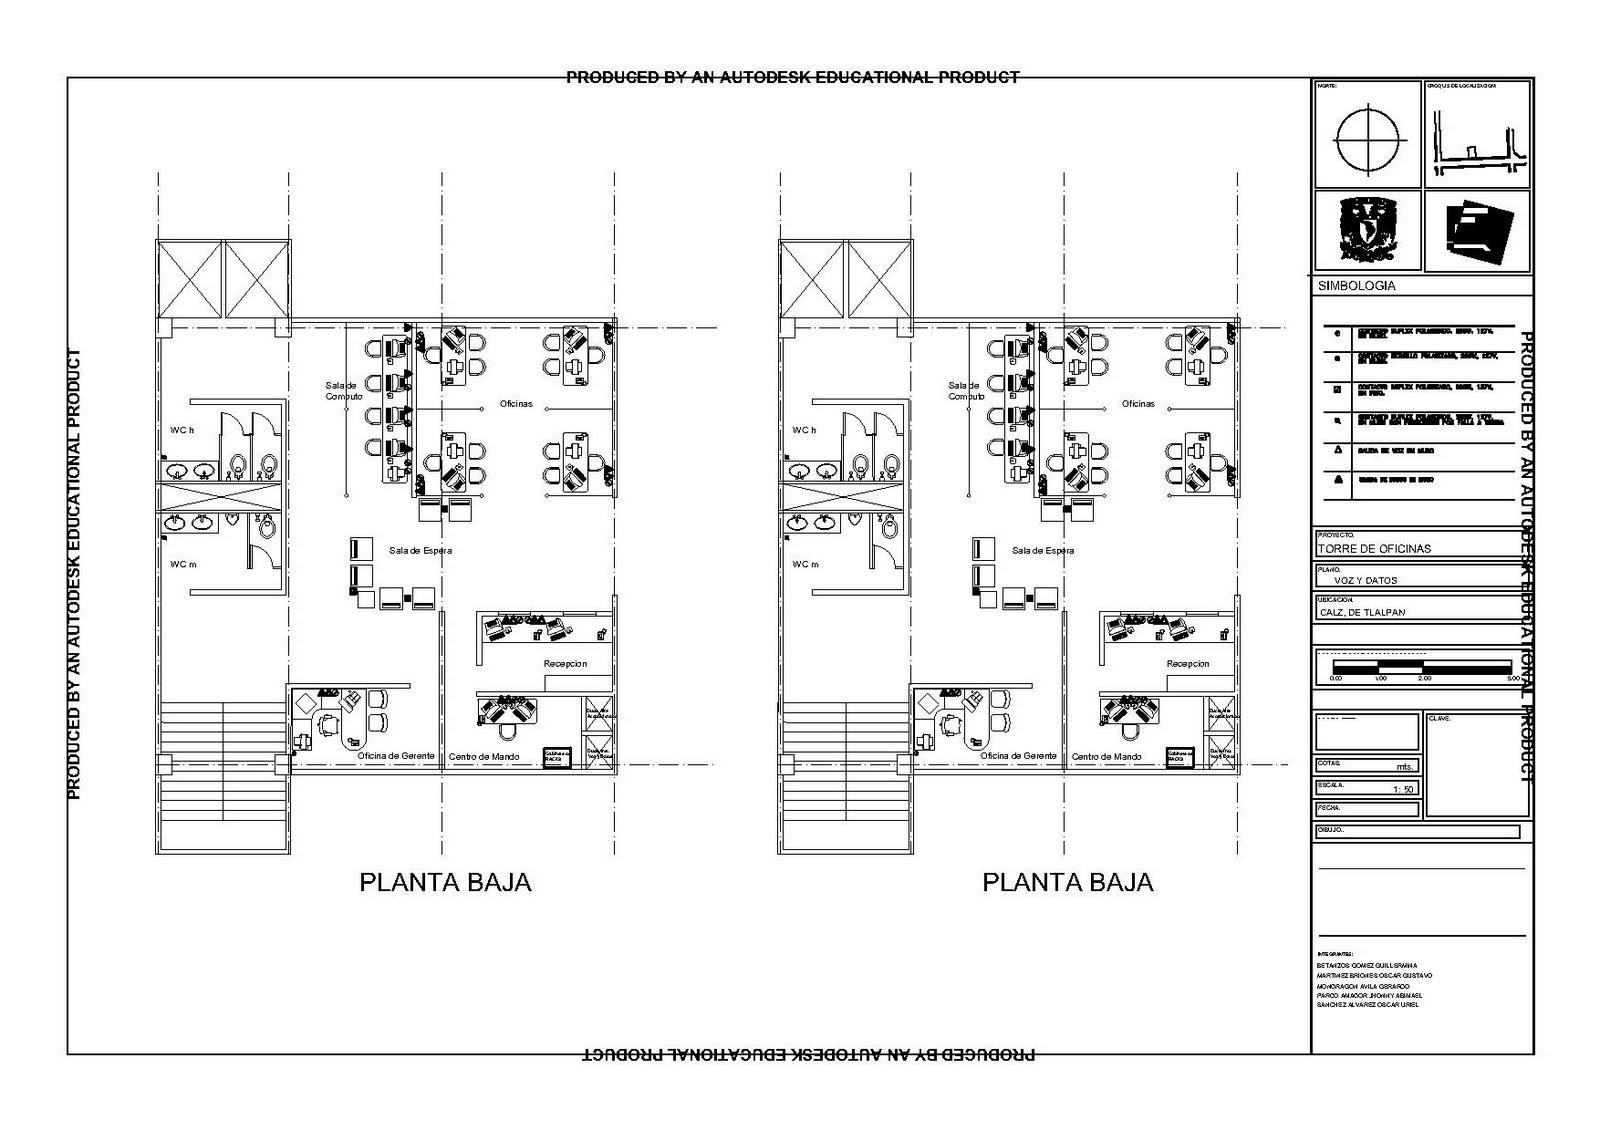 hight resolution of 2002 polaris sportsman 500 ho wiring diagram 2003 predator 500 wiring diagram 2004 polaris predator 500